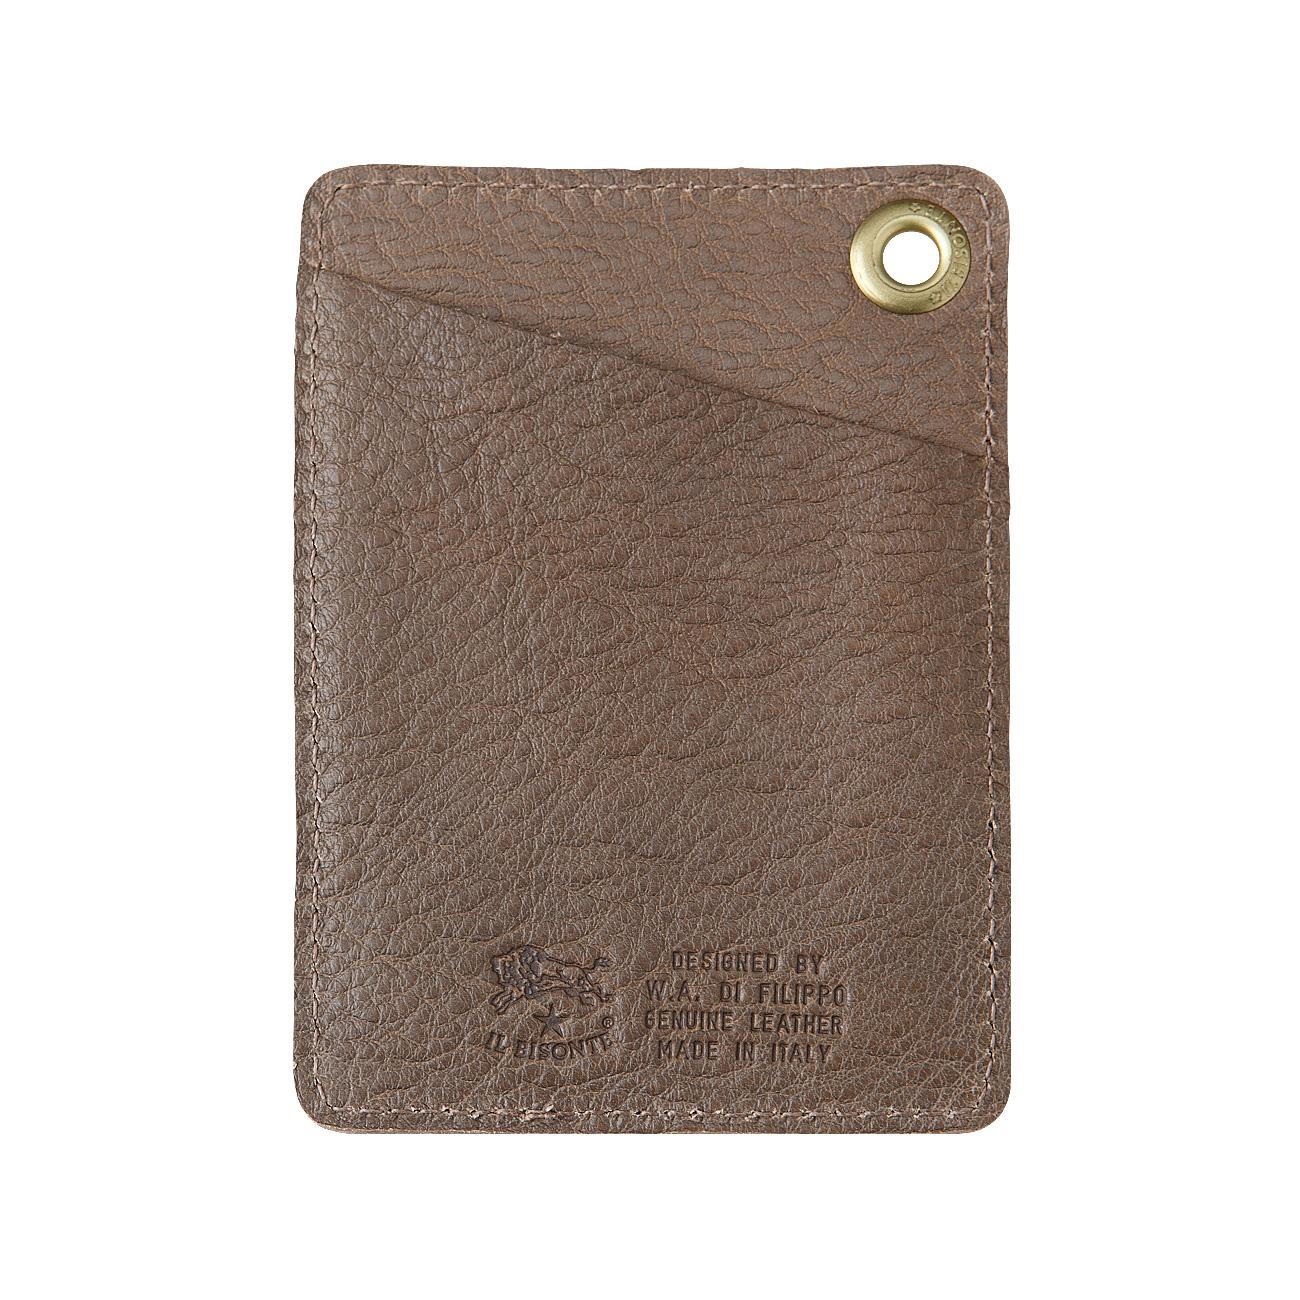 IL BISONTE (イル ビゾンテ) 日本公式オンラインストア カードケース 5412305190